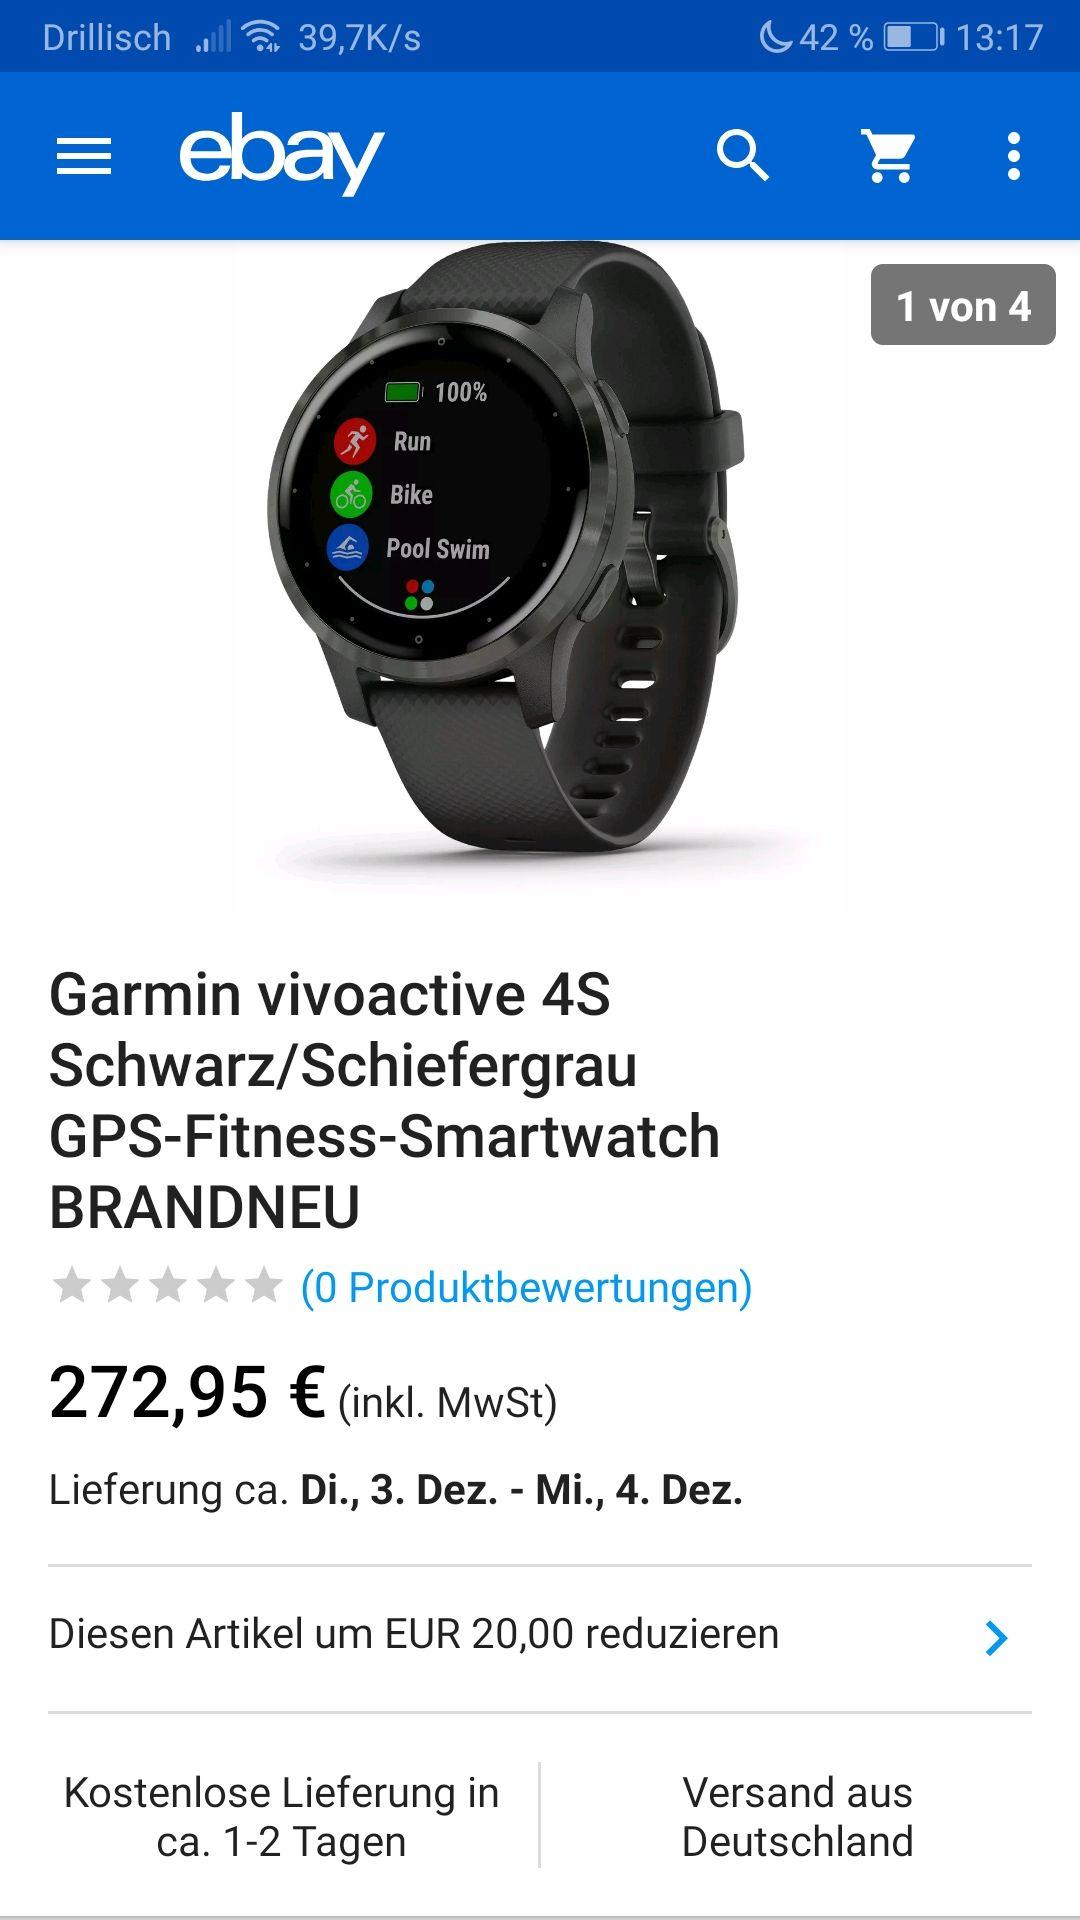 Garmin vivoactive 4s schwarz Smartwatch